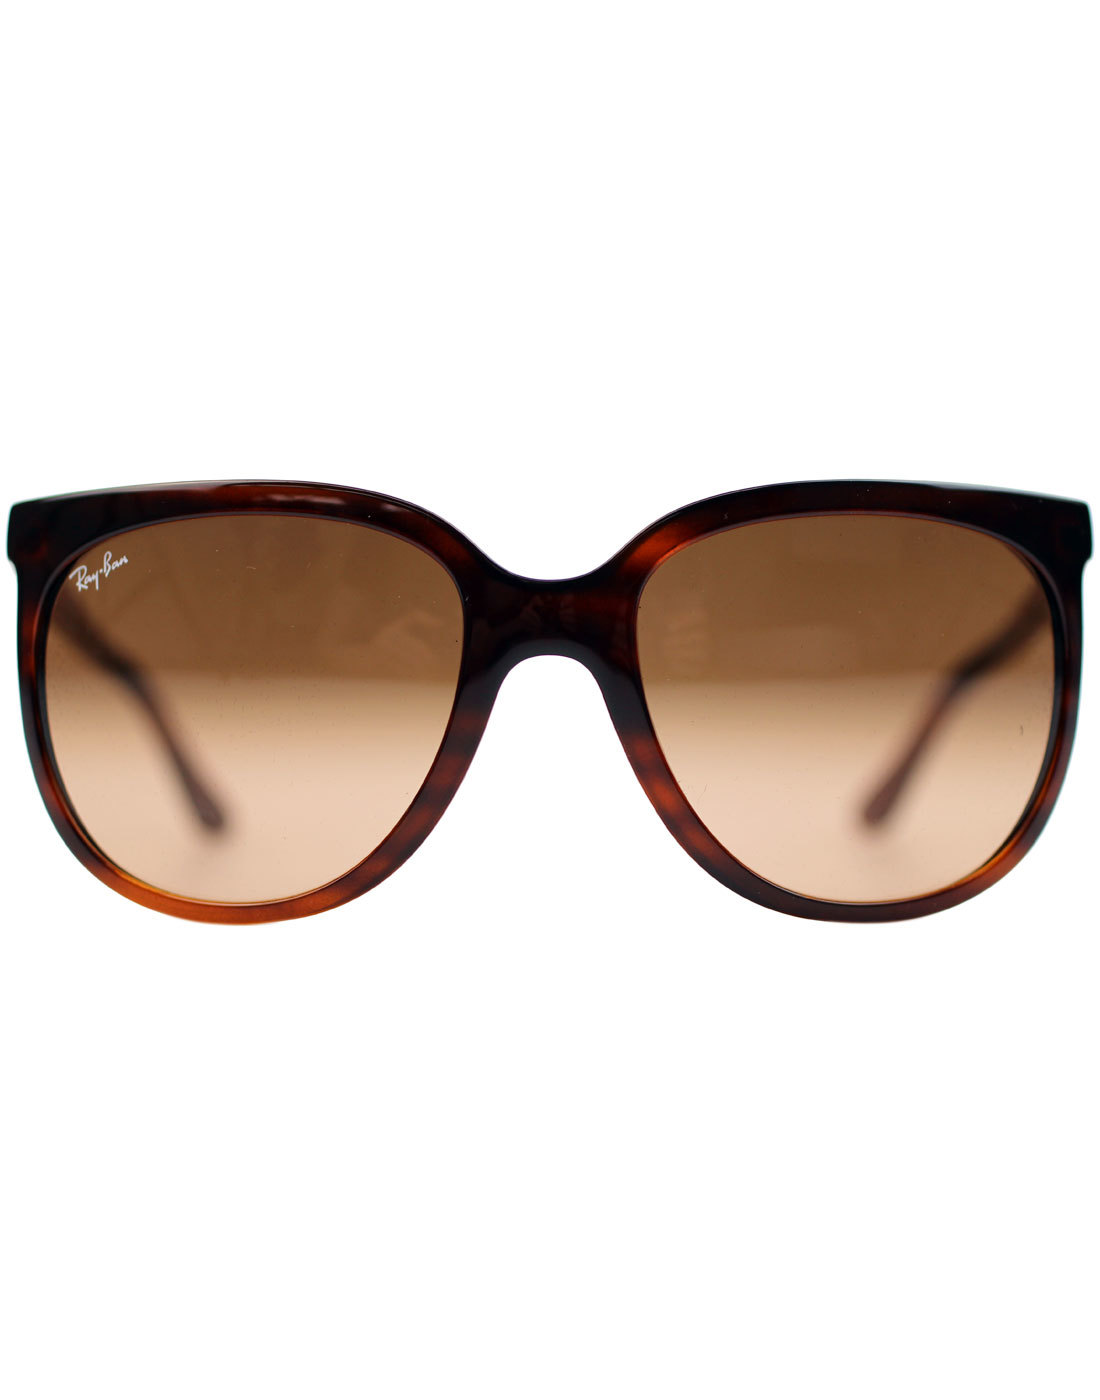 Cats 1000 RAY-BAN Retro 70s Wayfarer Sunglasses H